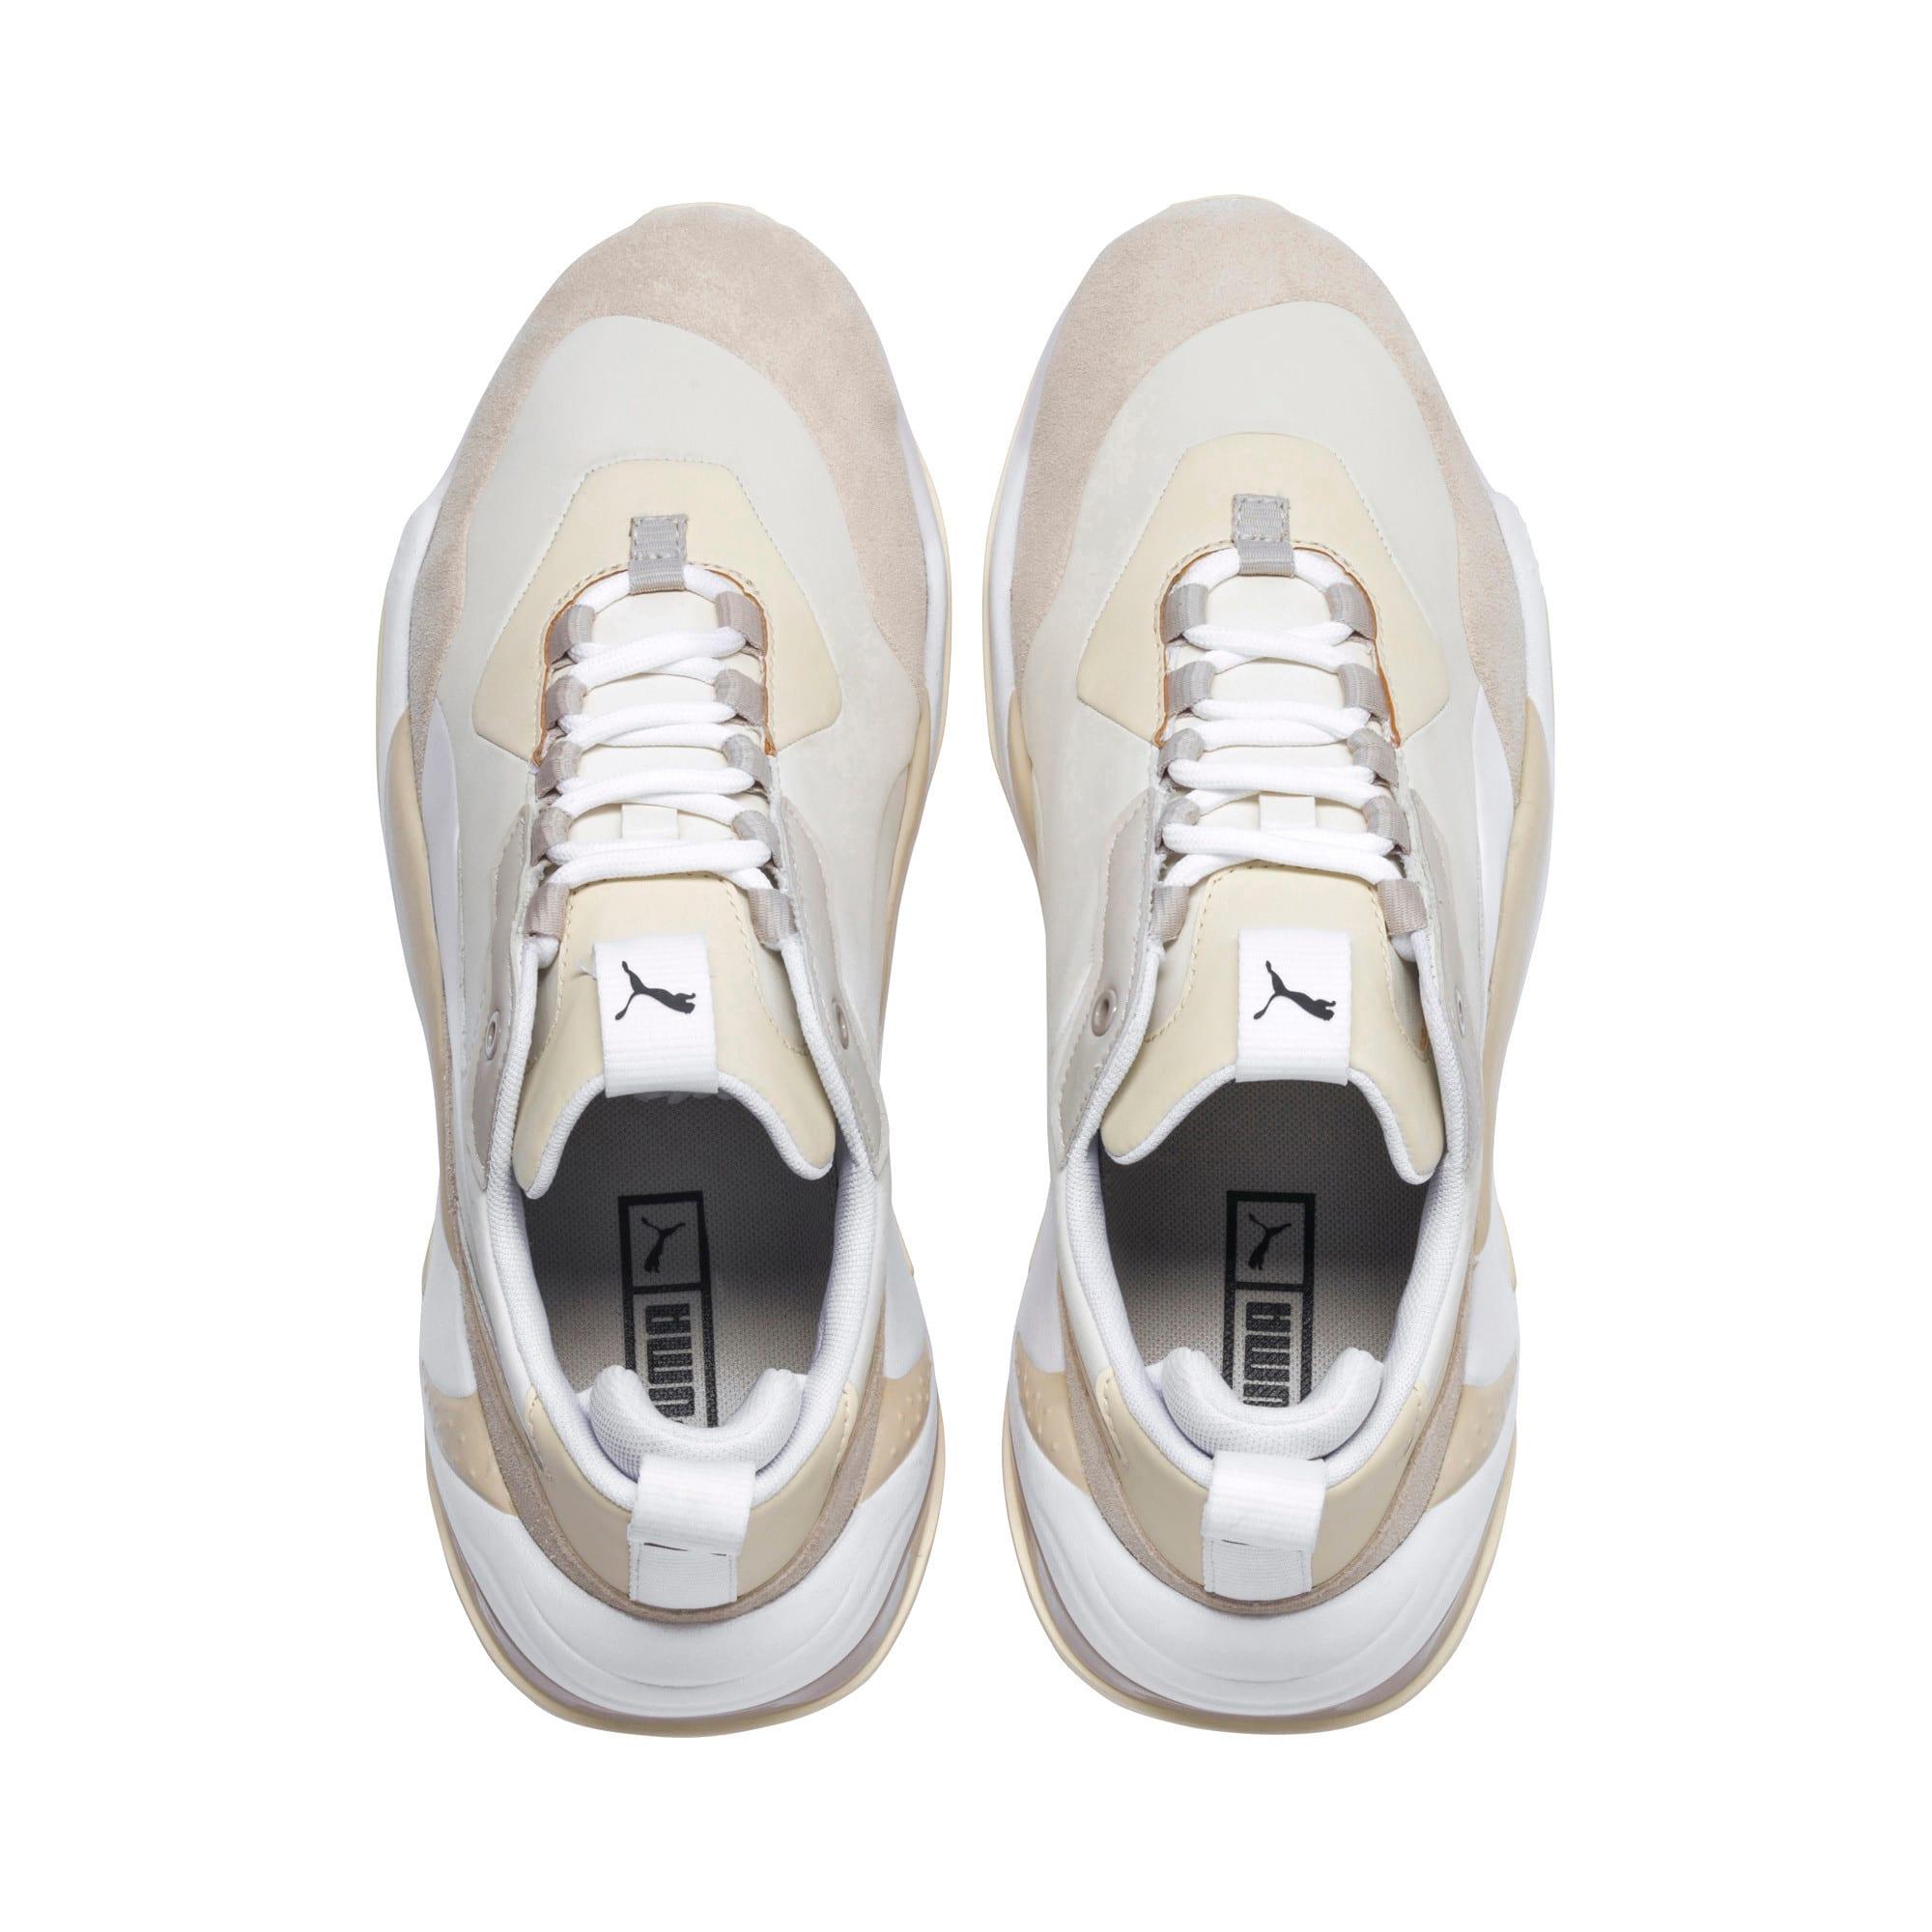 Thumbnail 6 of Thunder Nature Sneakers, S Gray-W White-Cloud Cream, medium